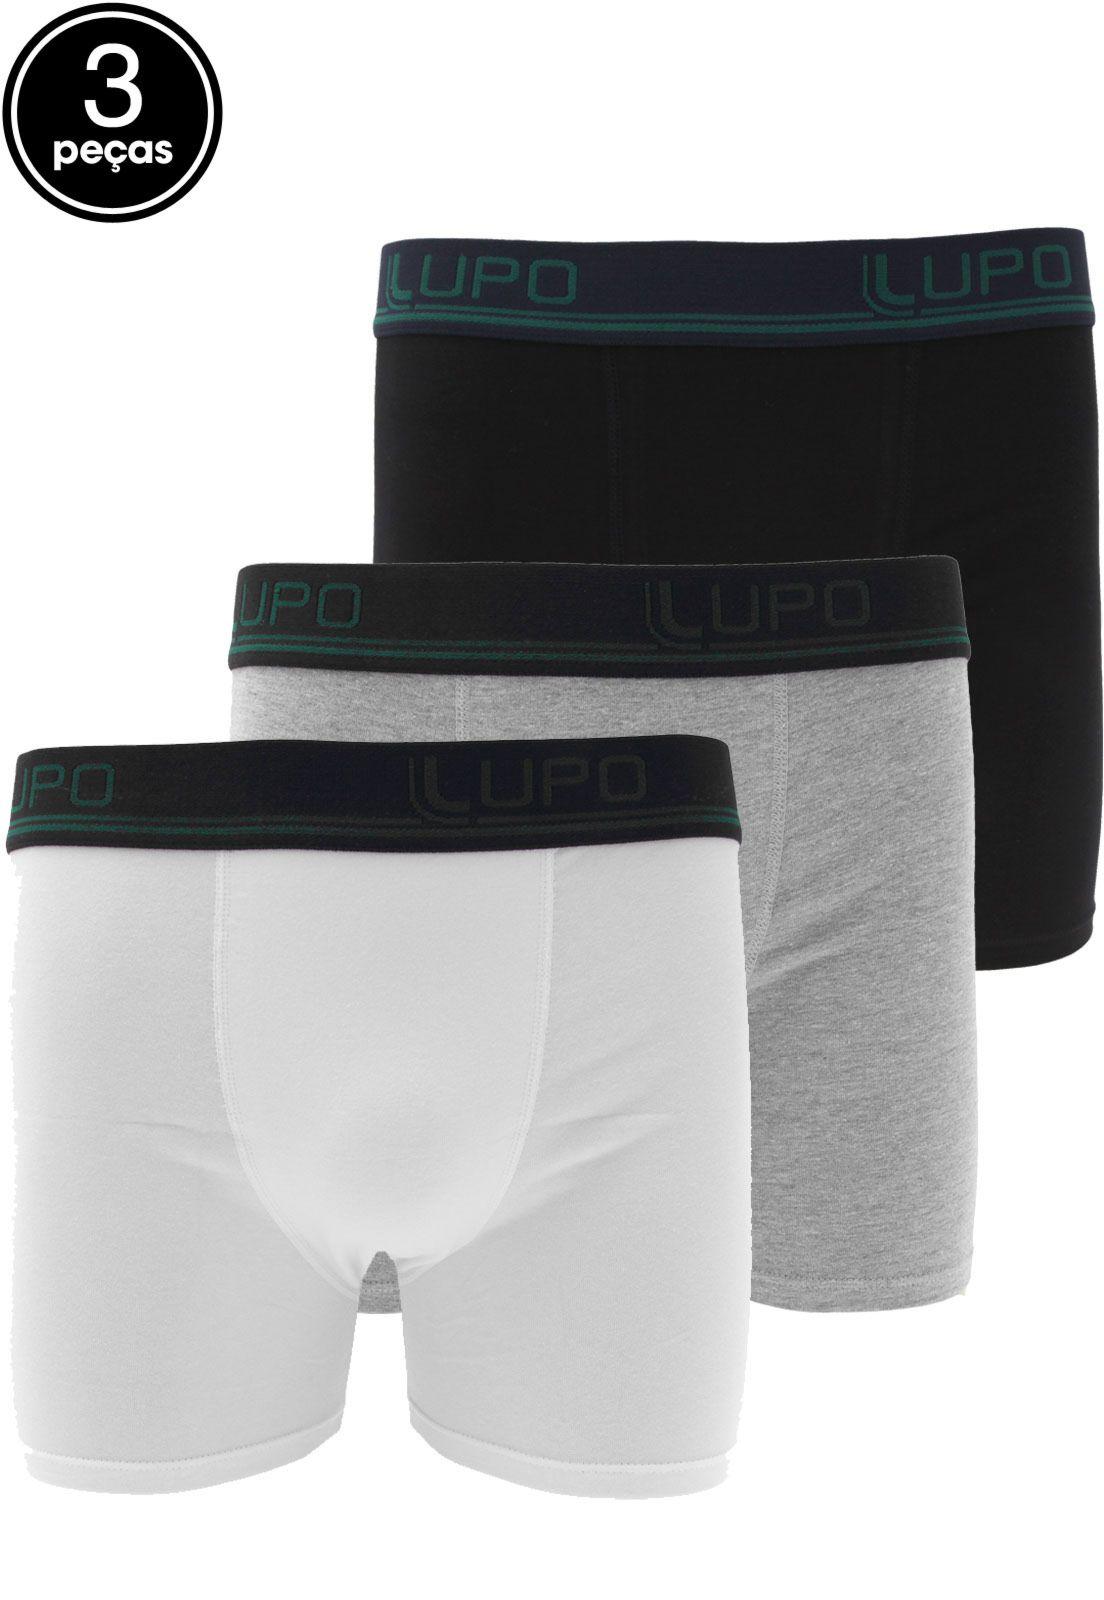 4852946437a5f8 Kit 3pçs Cueca Lupo Boxer Lettering Branco/Preto/Cinza | Products em ...